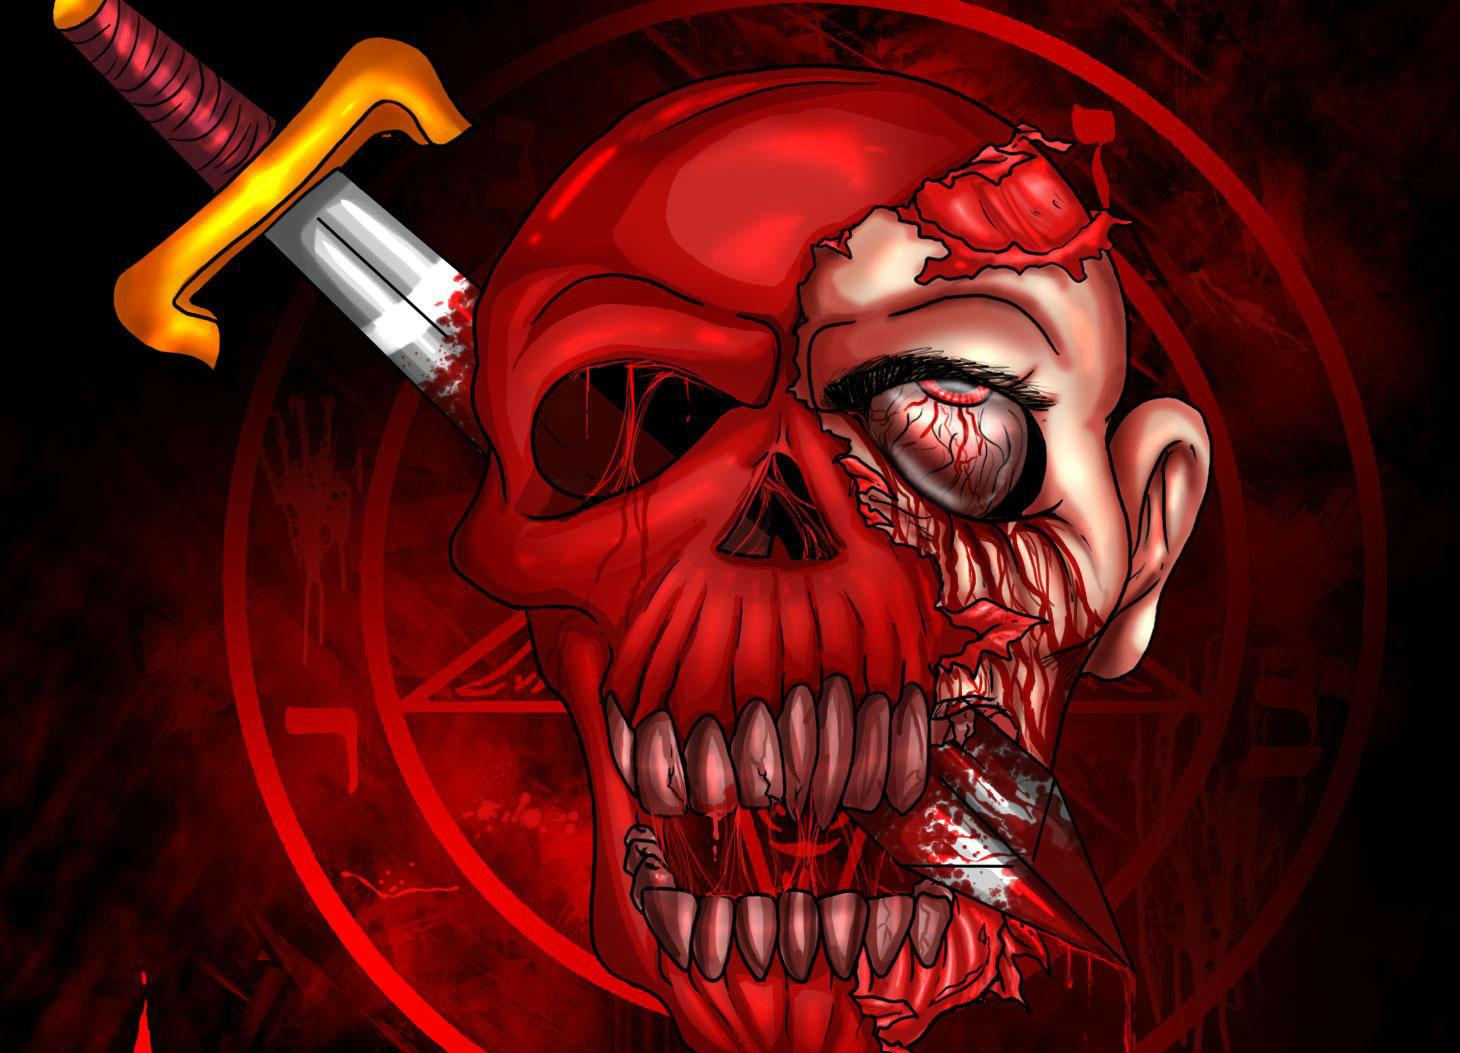 Dark   Occult Weapon Skull Satan Satanism Satanic Skulls Wallpaper 1460x1053